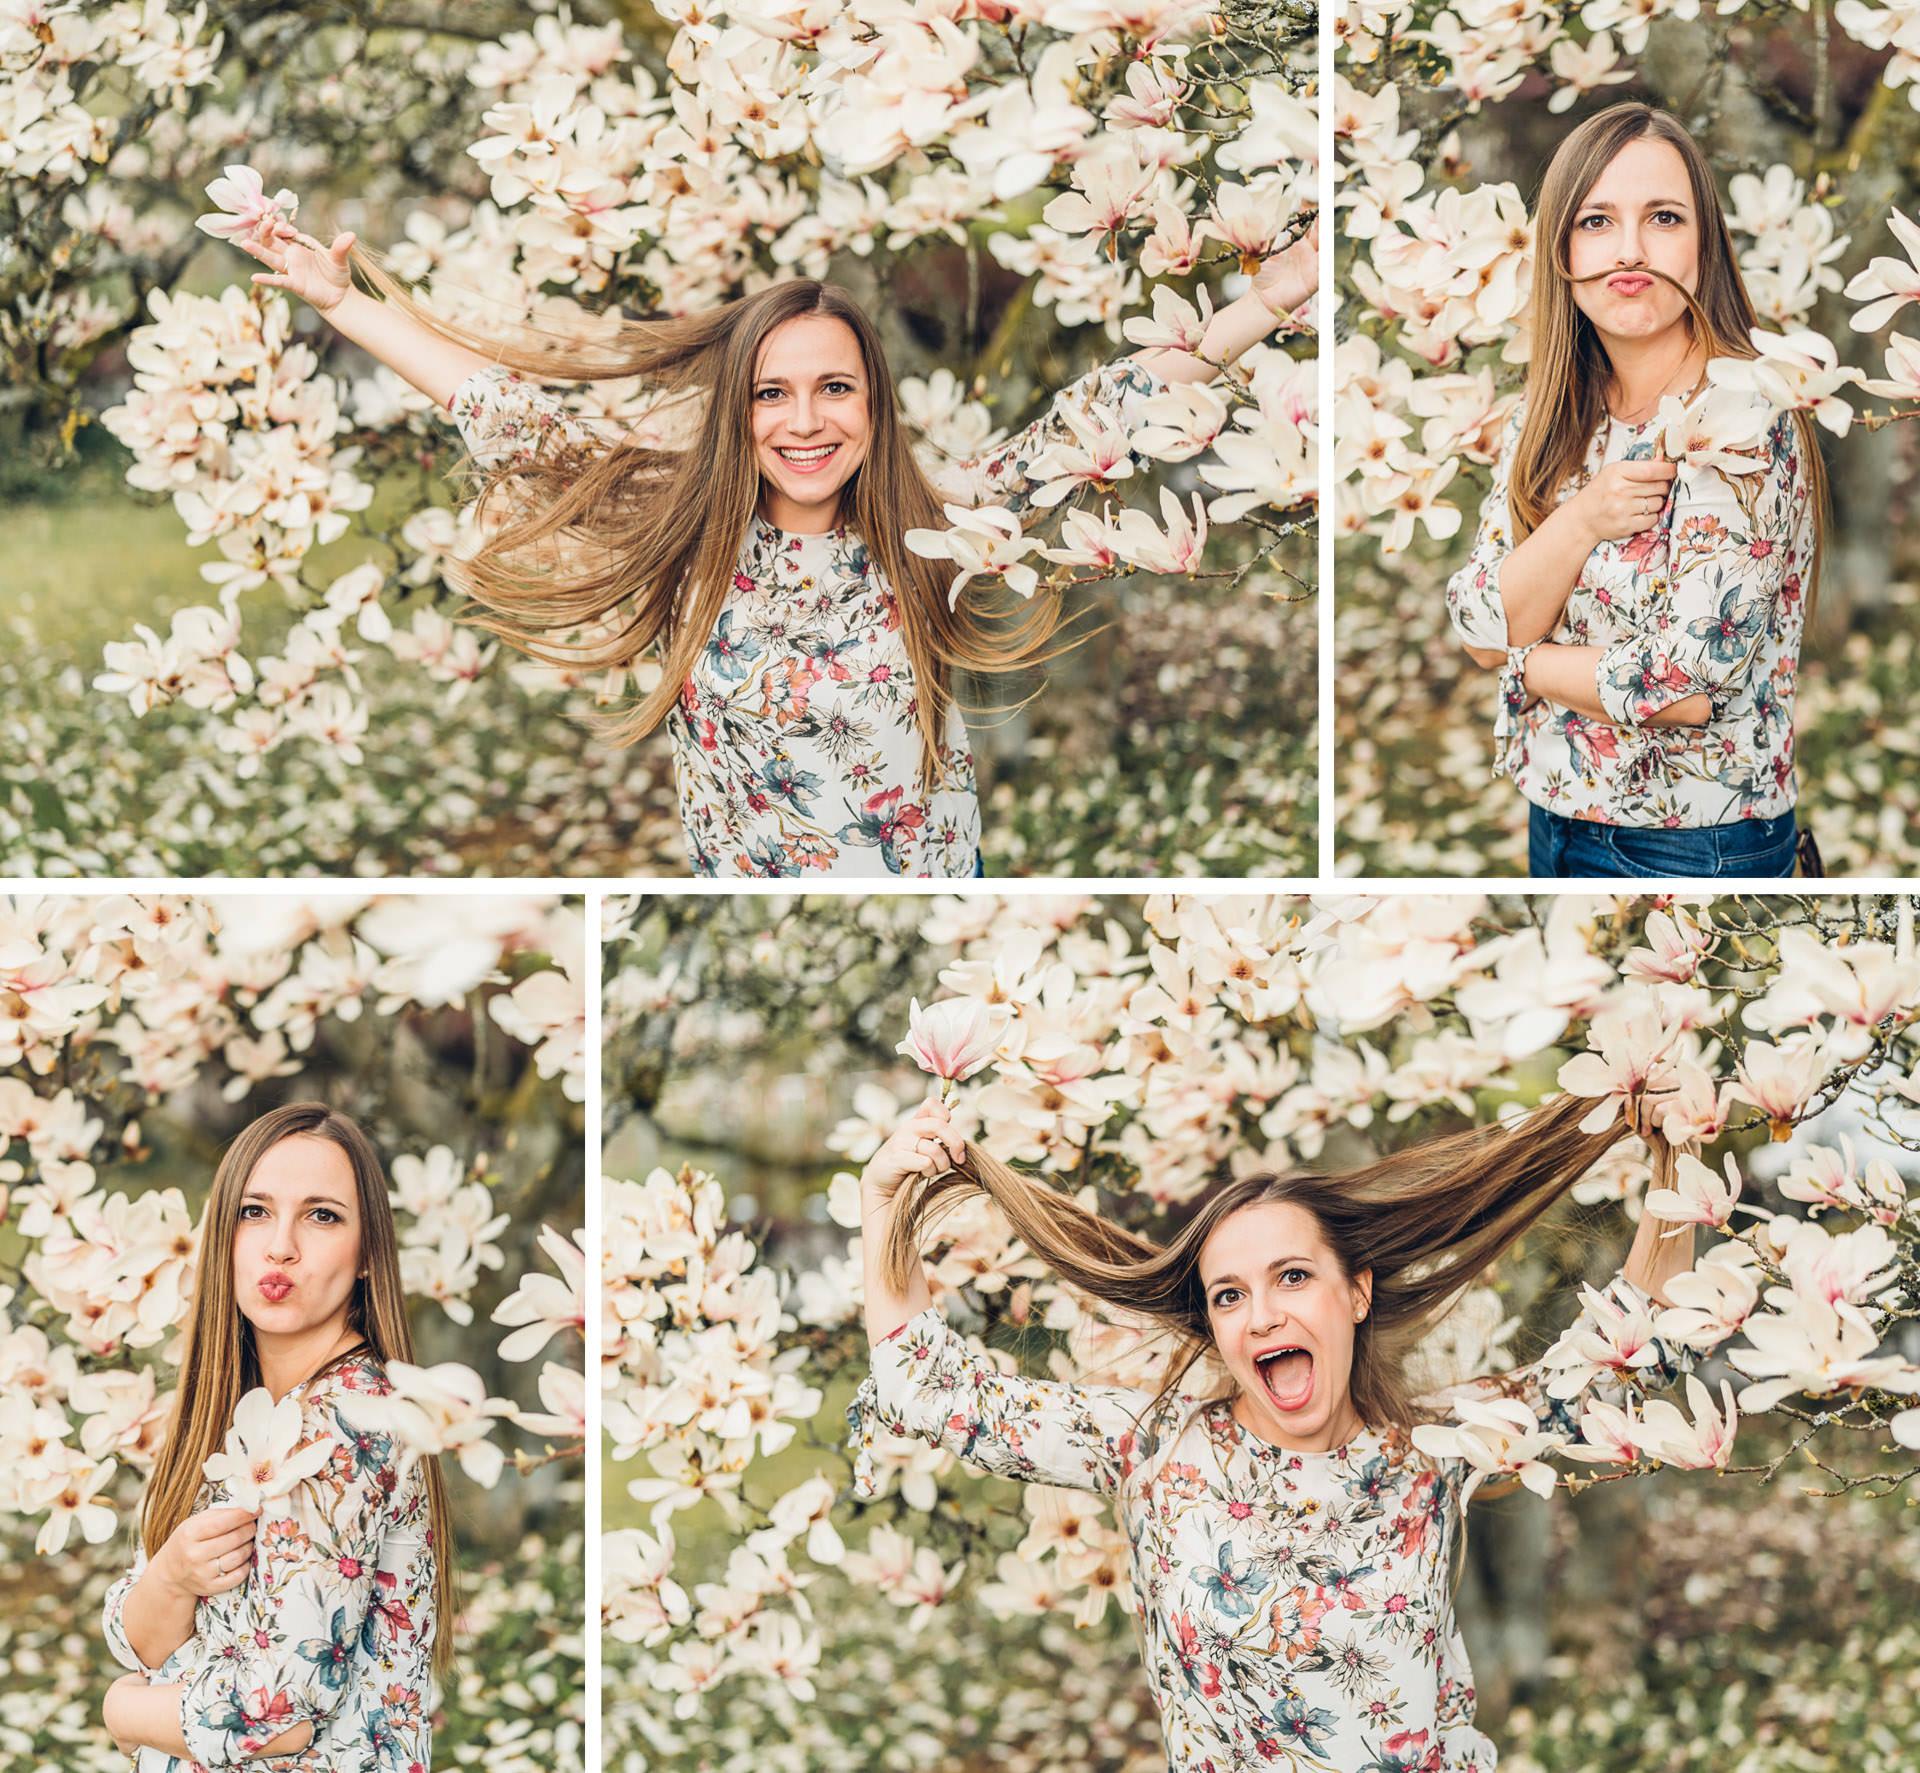 lustige Portraits beim ersten Fotoshooting in Magnolien